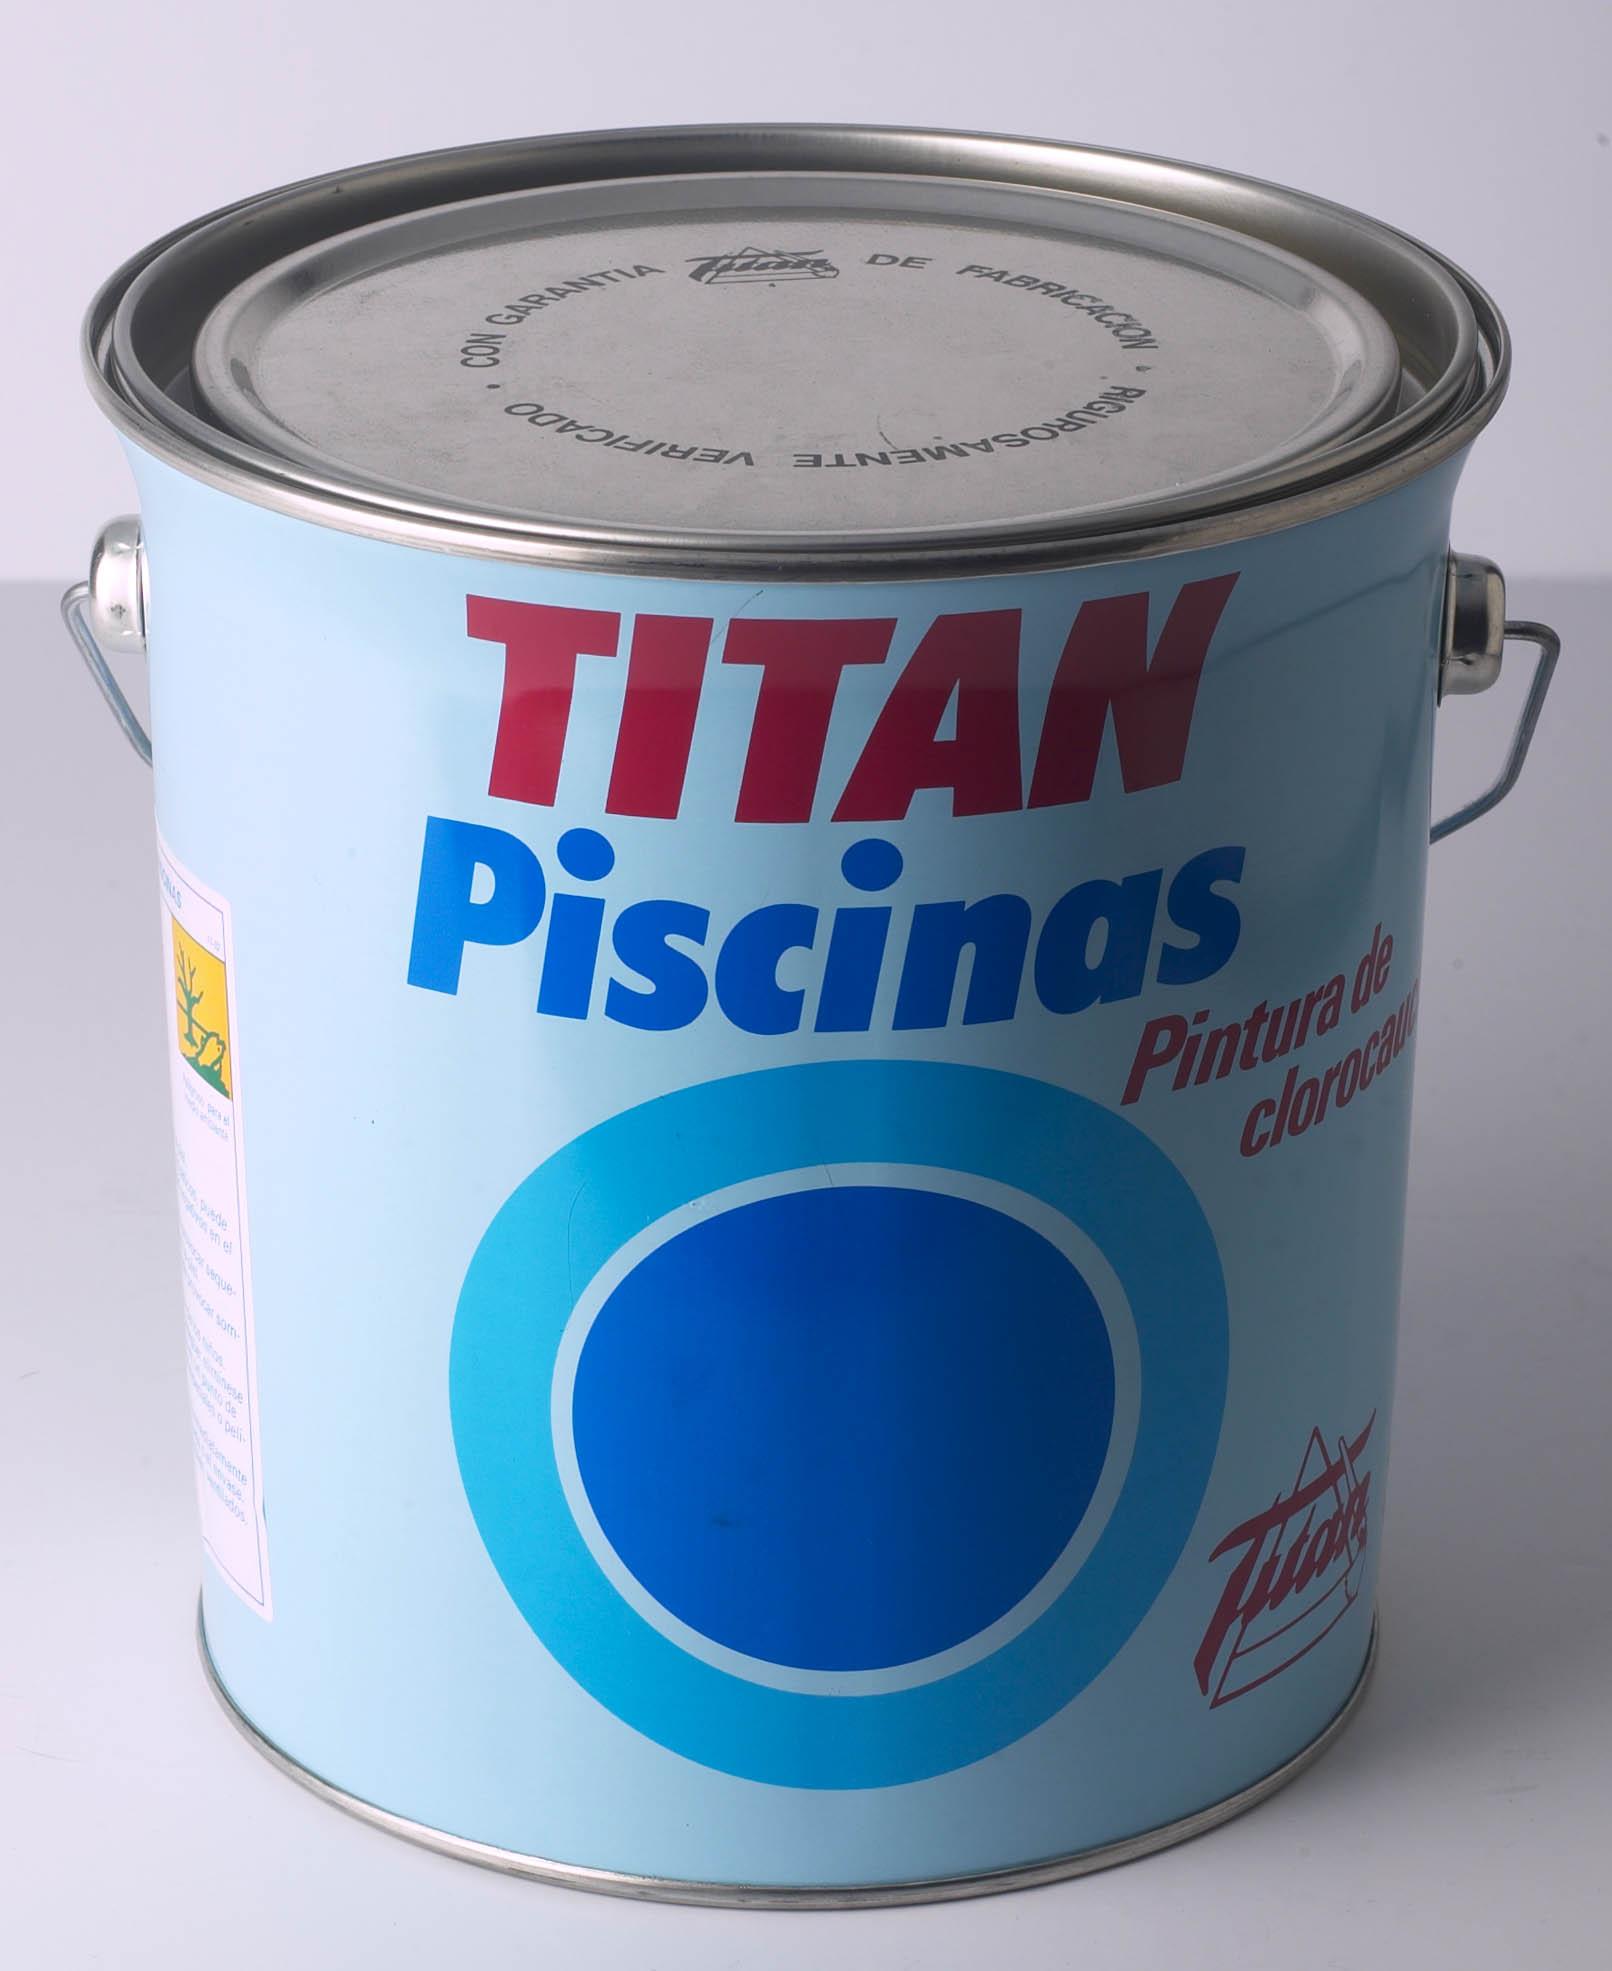 TITAN PISCINAS